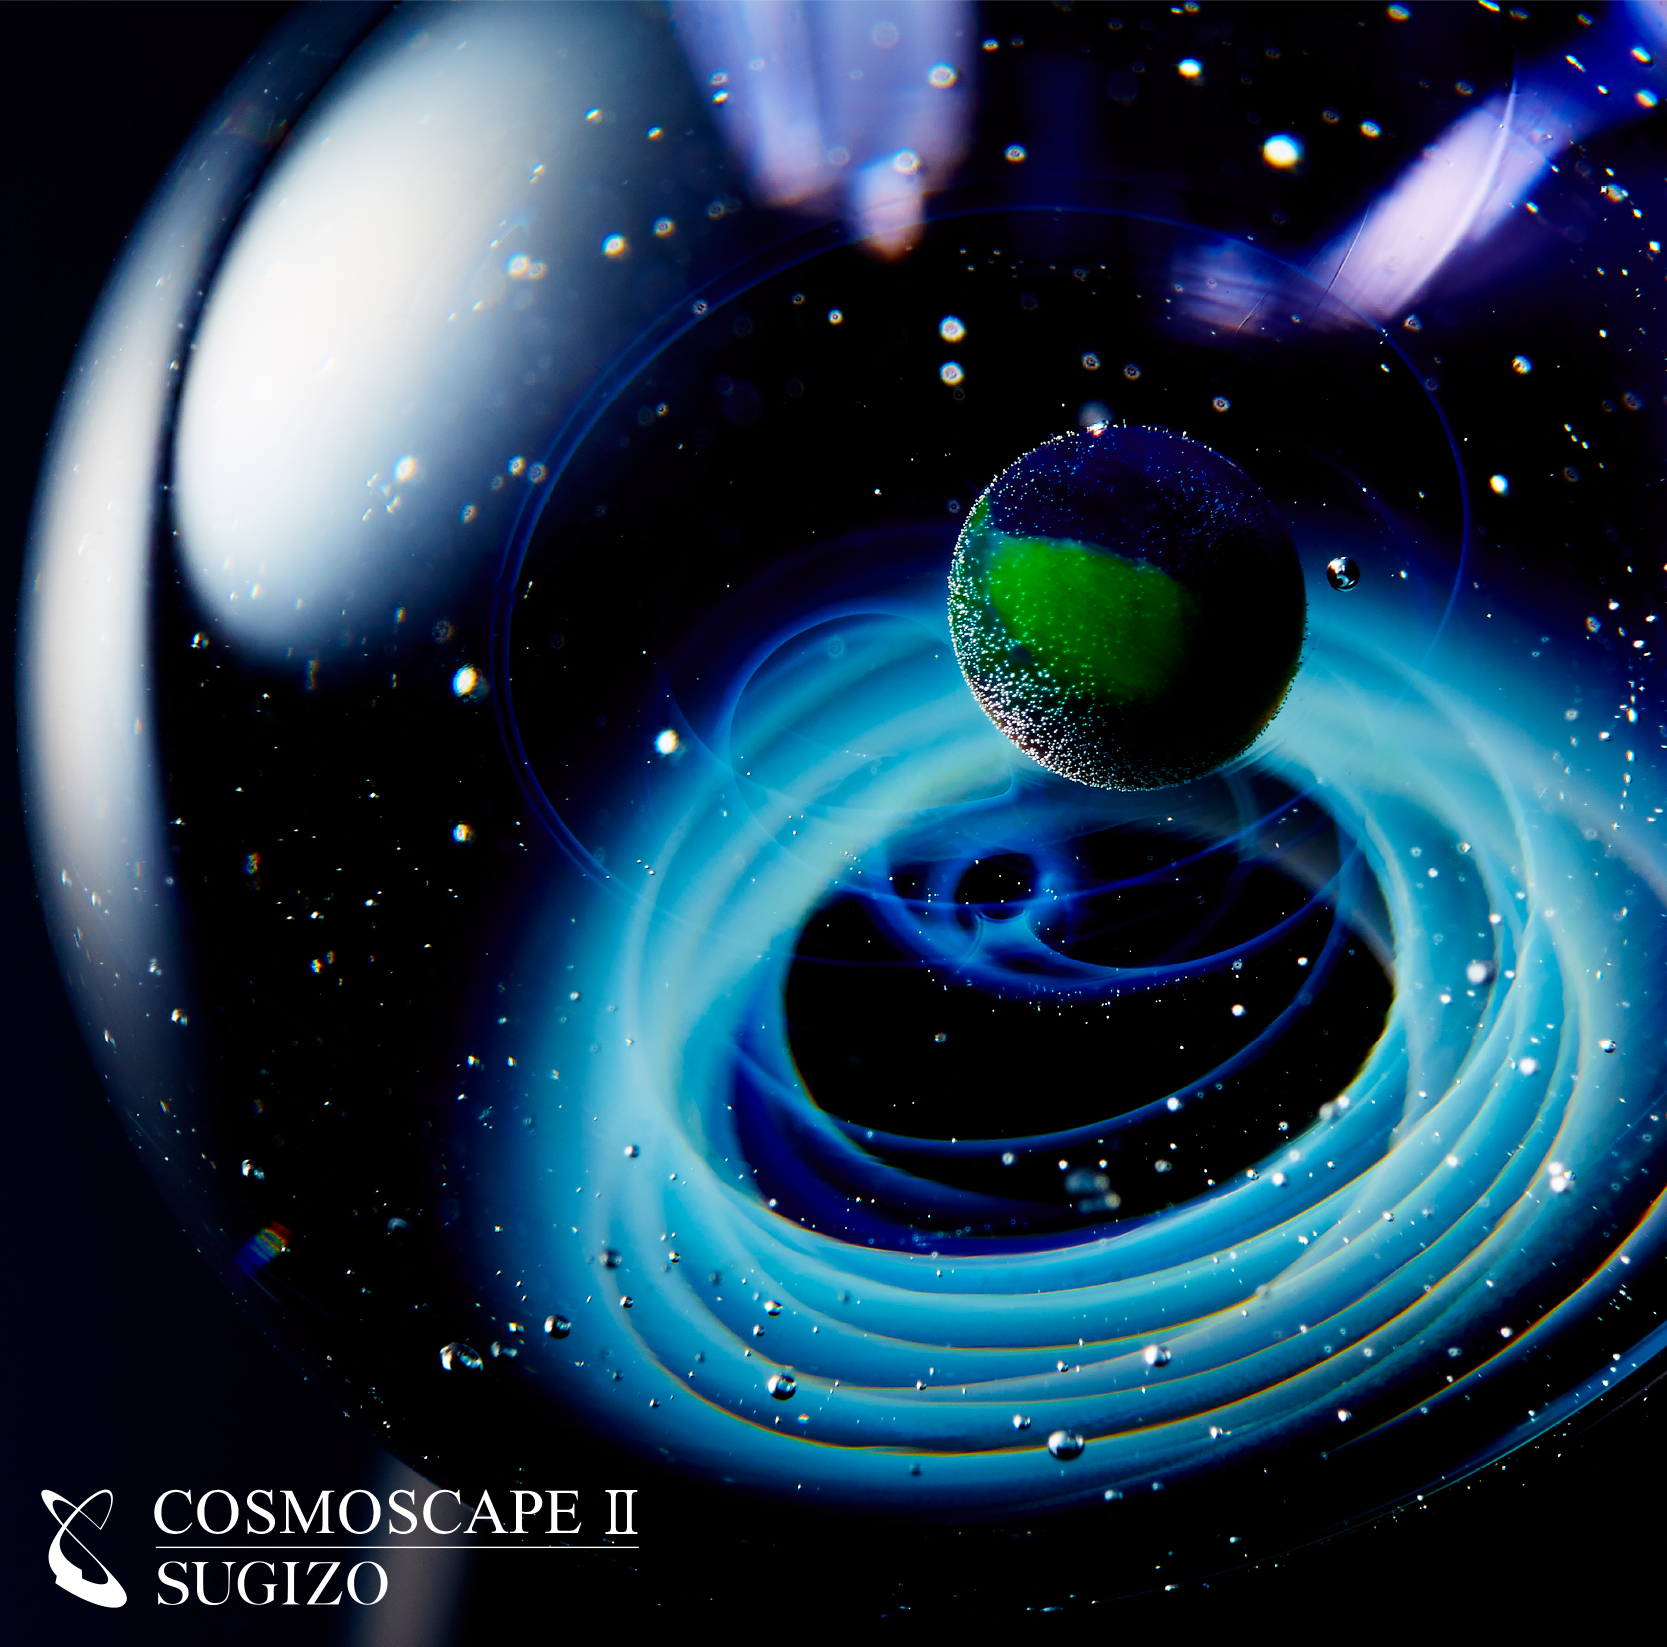 COSMOSCAPE Ⅱ